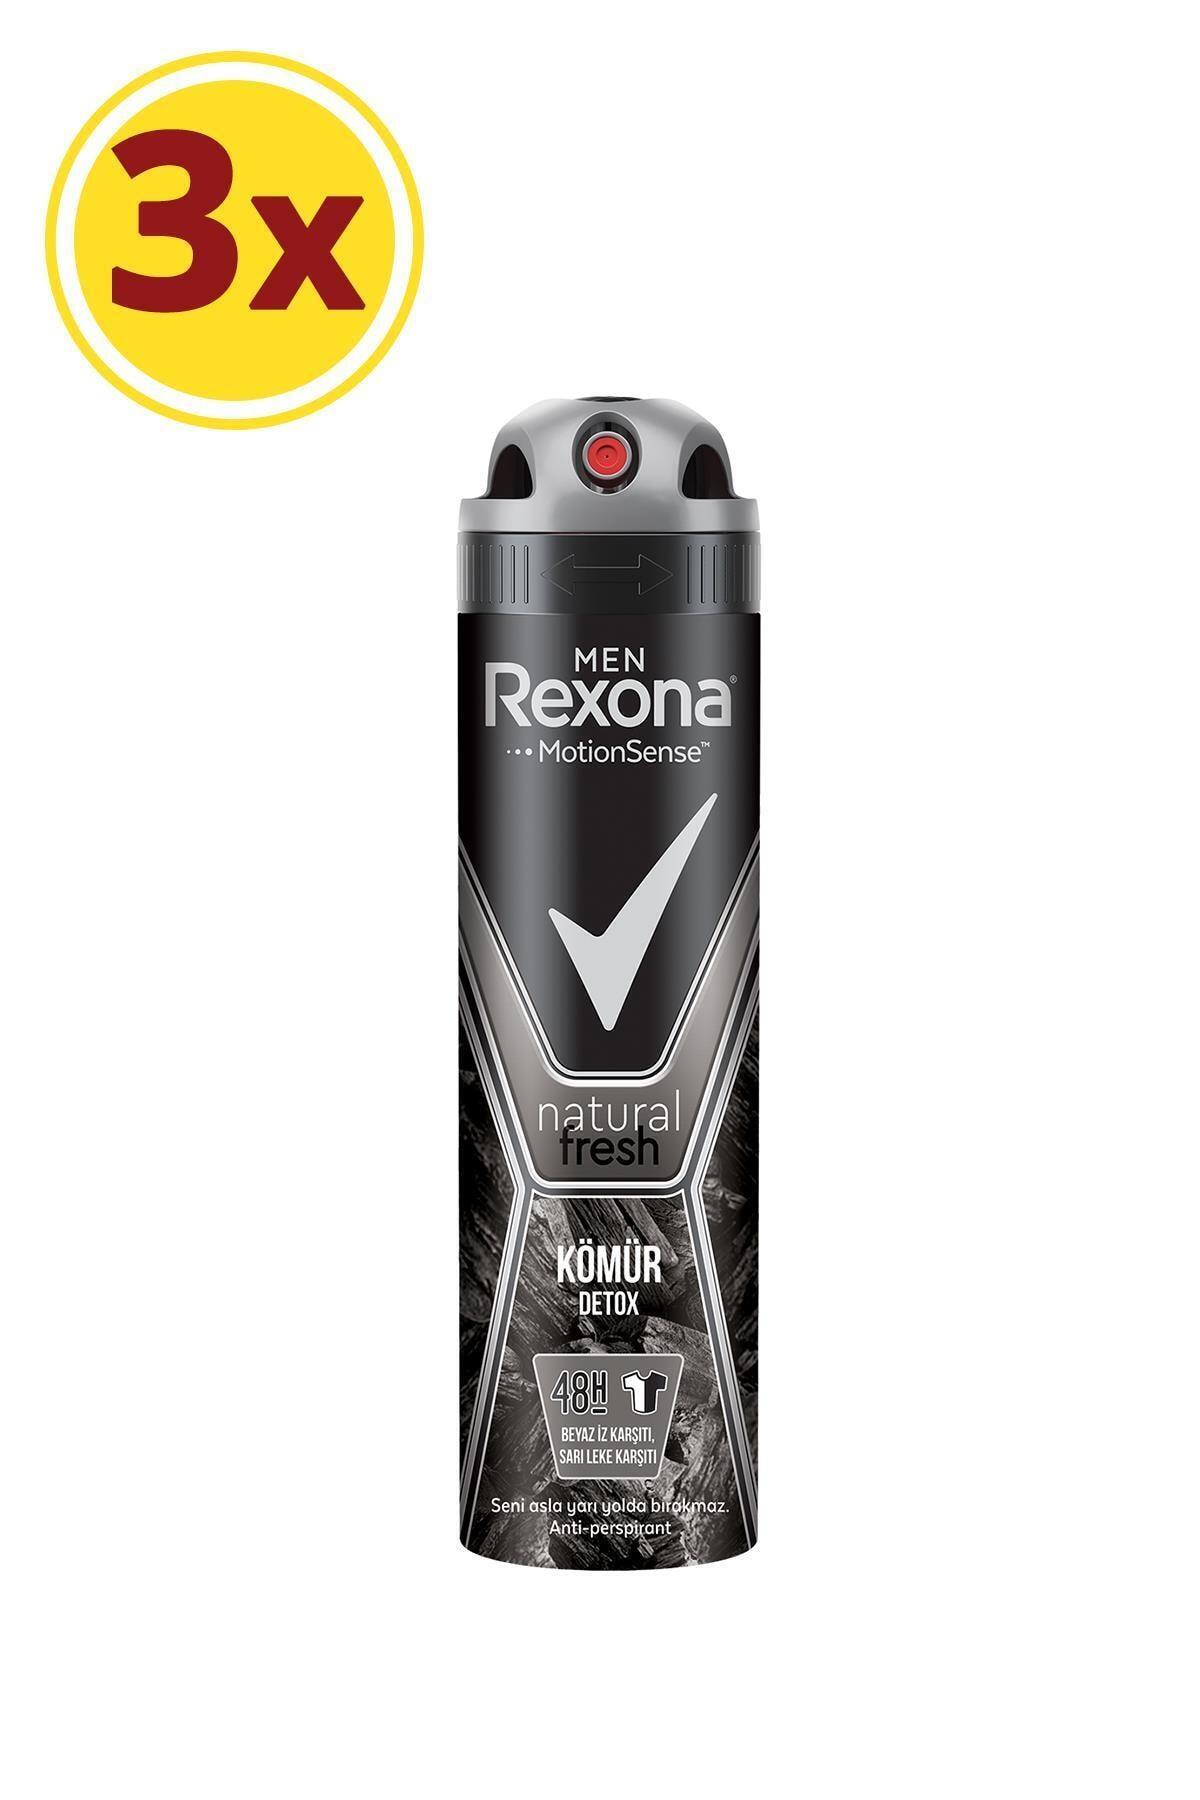 Rexona Men Natural Fresh Kömür Detox Erkek Sprey Deodorant 150 ml X 3 2